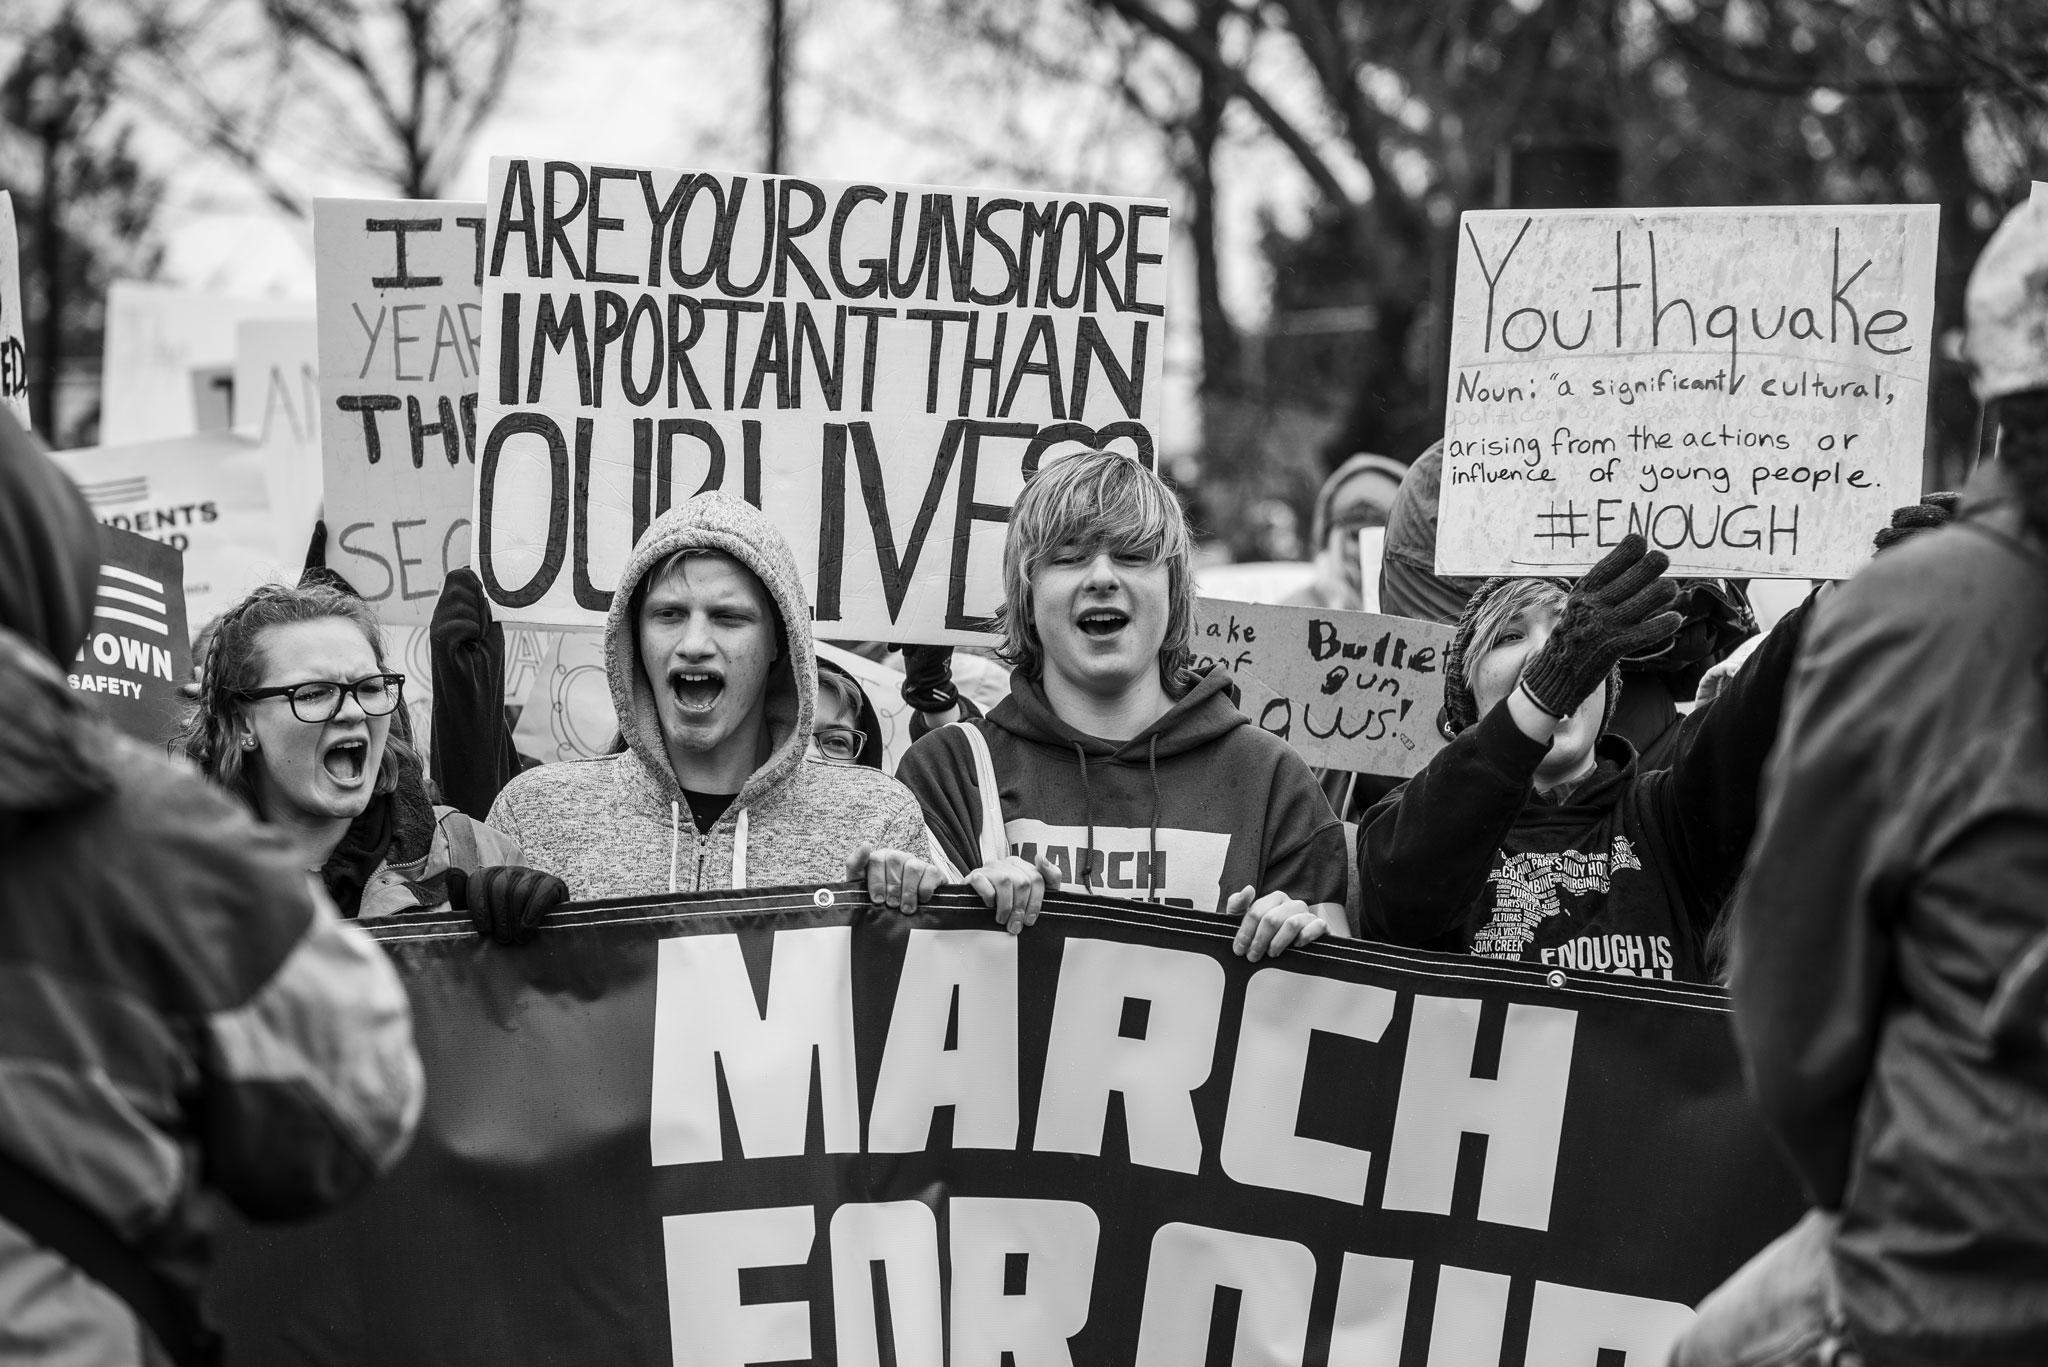 March for Our Lives Spokane Protest | Spokane Documentary Photographer